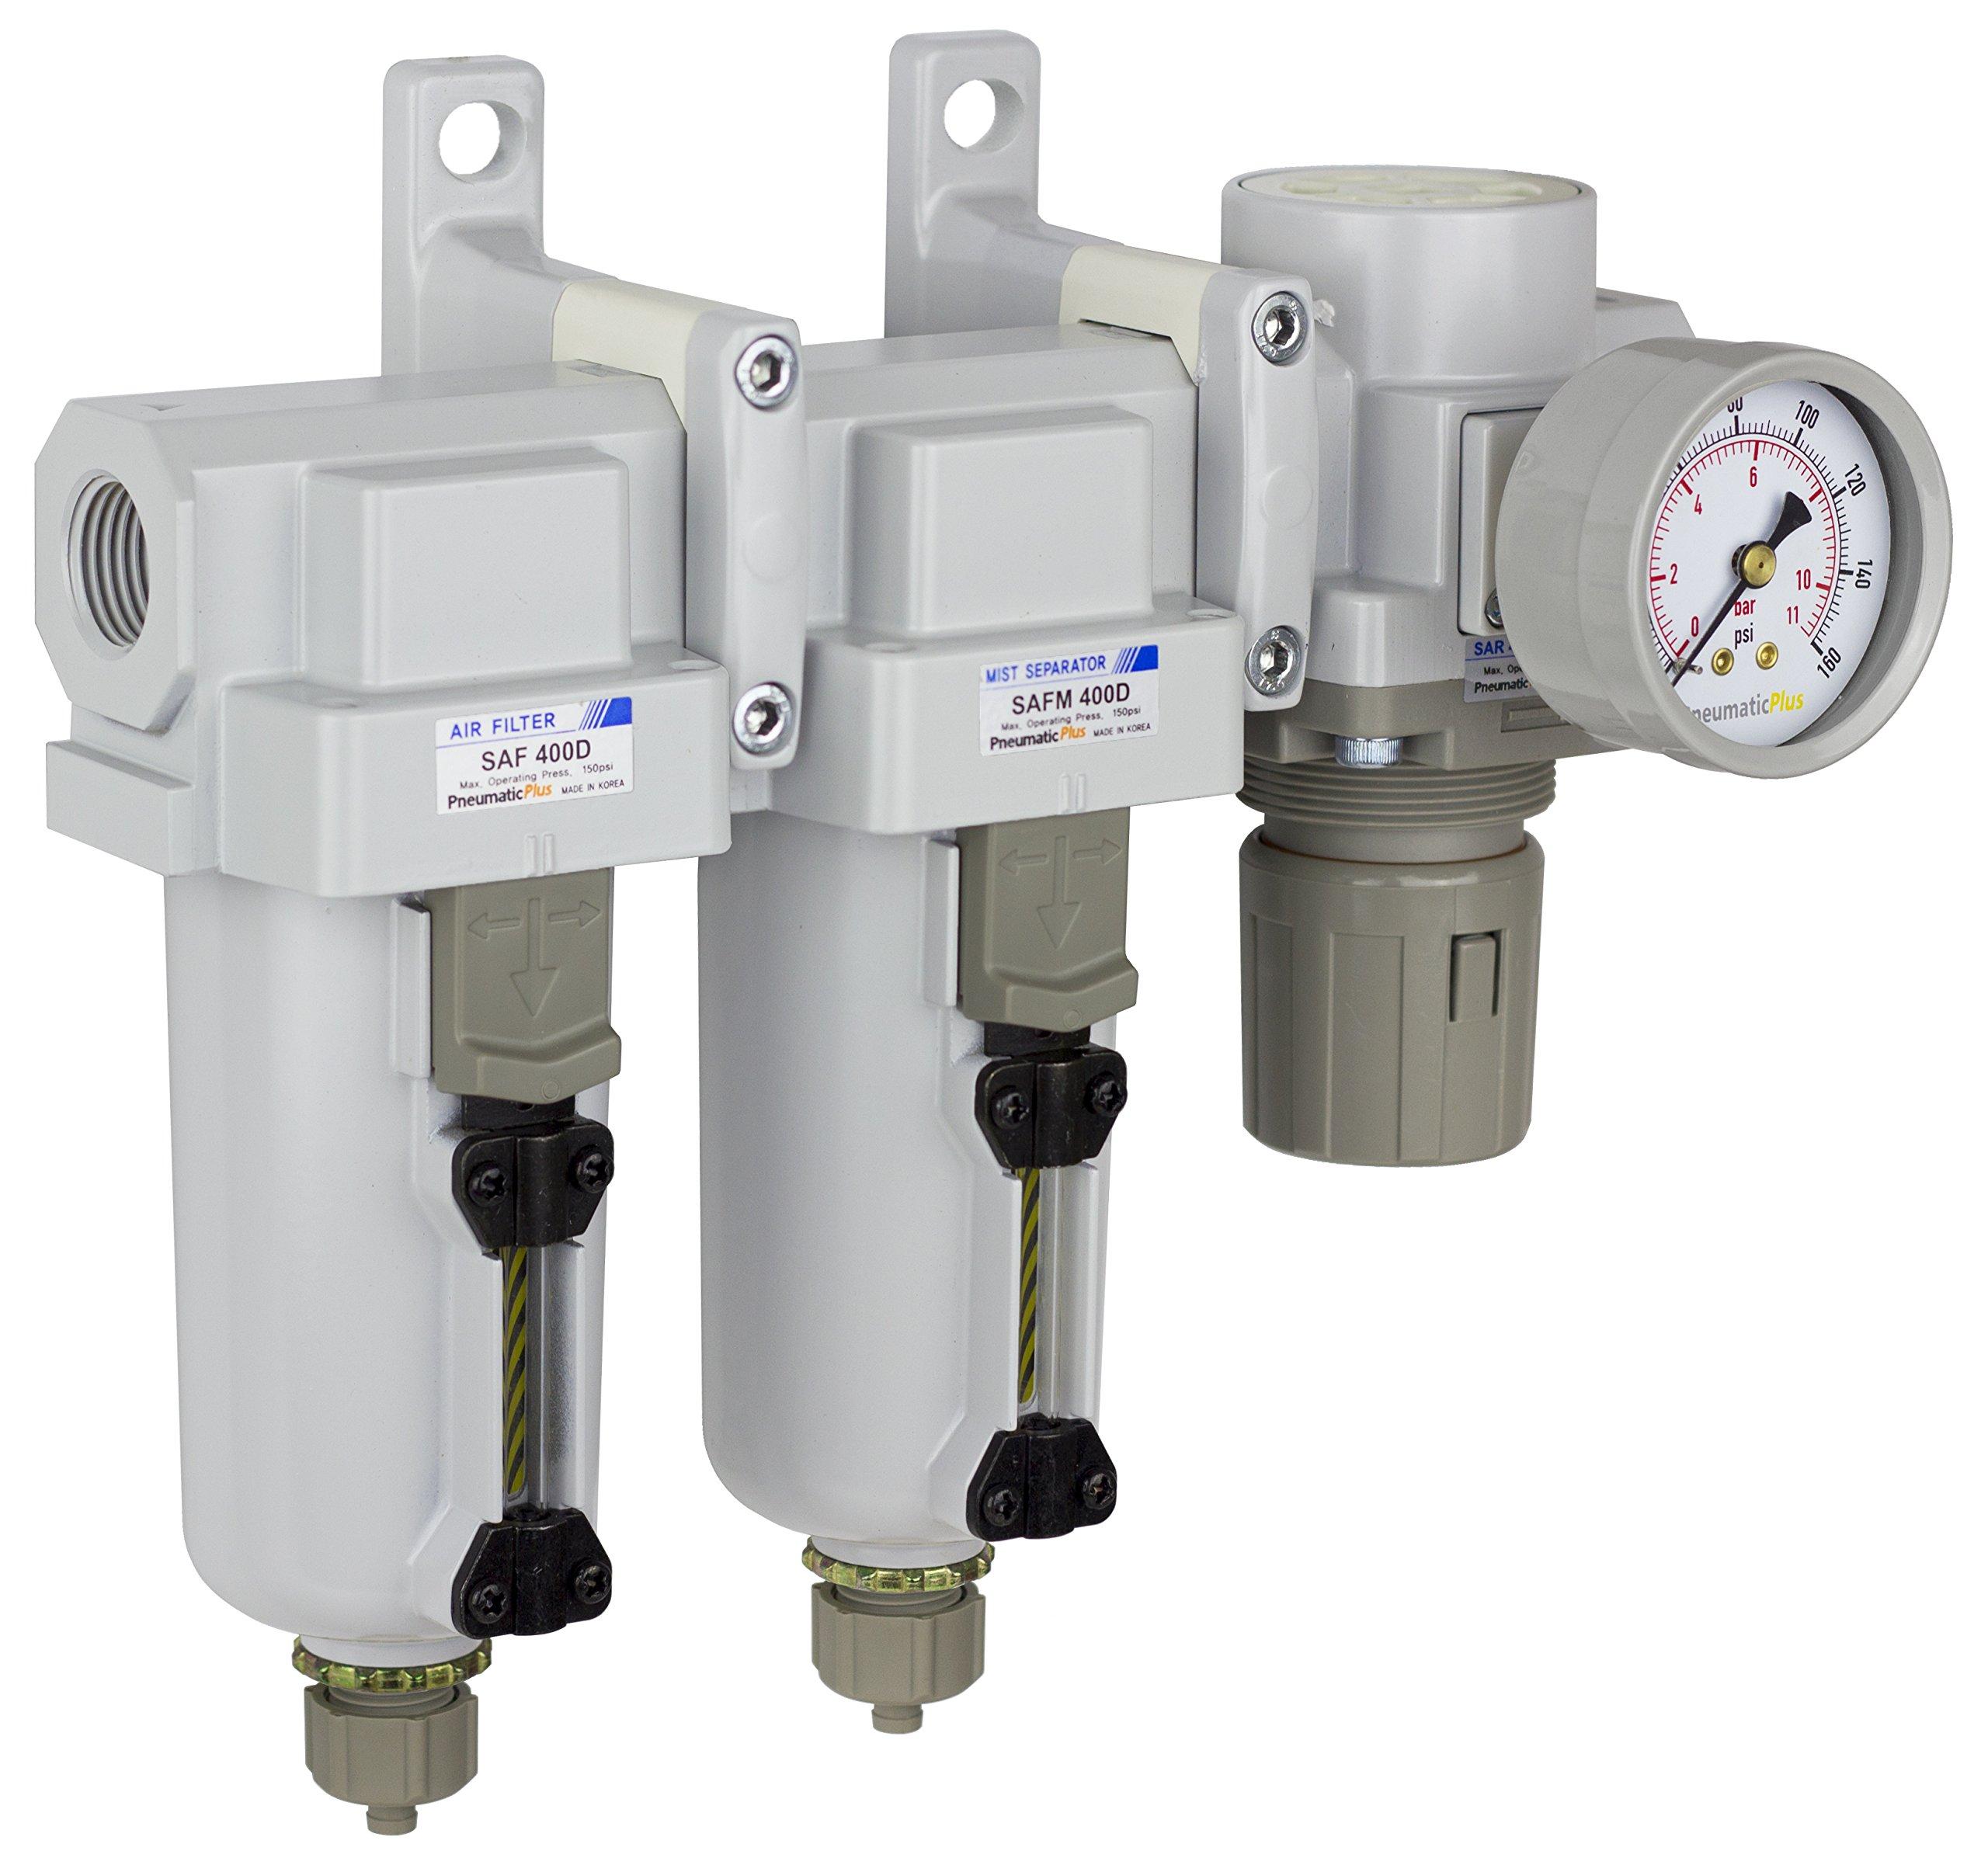 PneumaticPlus SAU430-N04G-MEP Three Stage Air Drying System Particulate Air Filter, Coalescing Filter, Air Pressure Regulator Combo 1/2'' NPT - Metal Bowl, Manual Drain, Bracket, Gauge